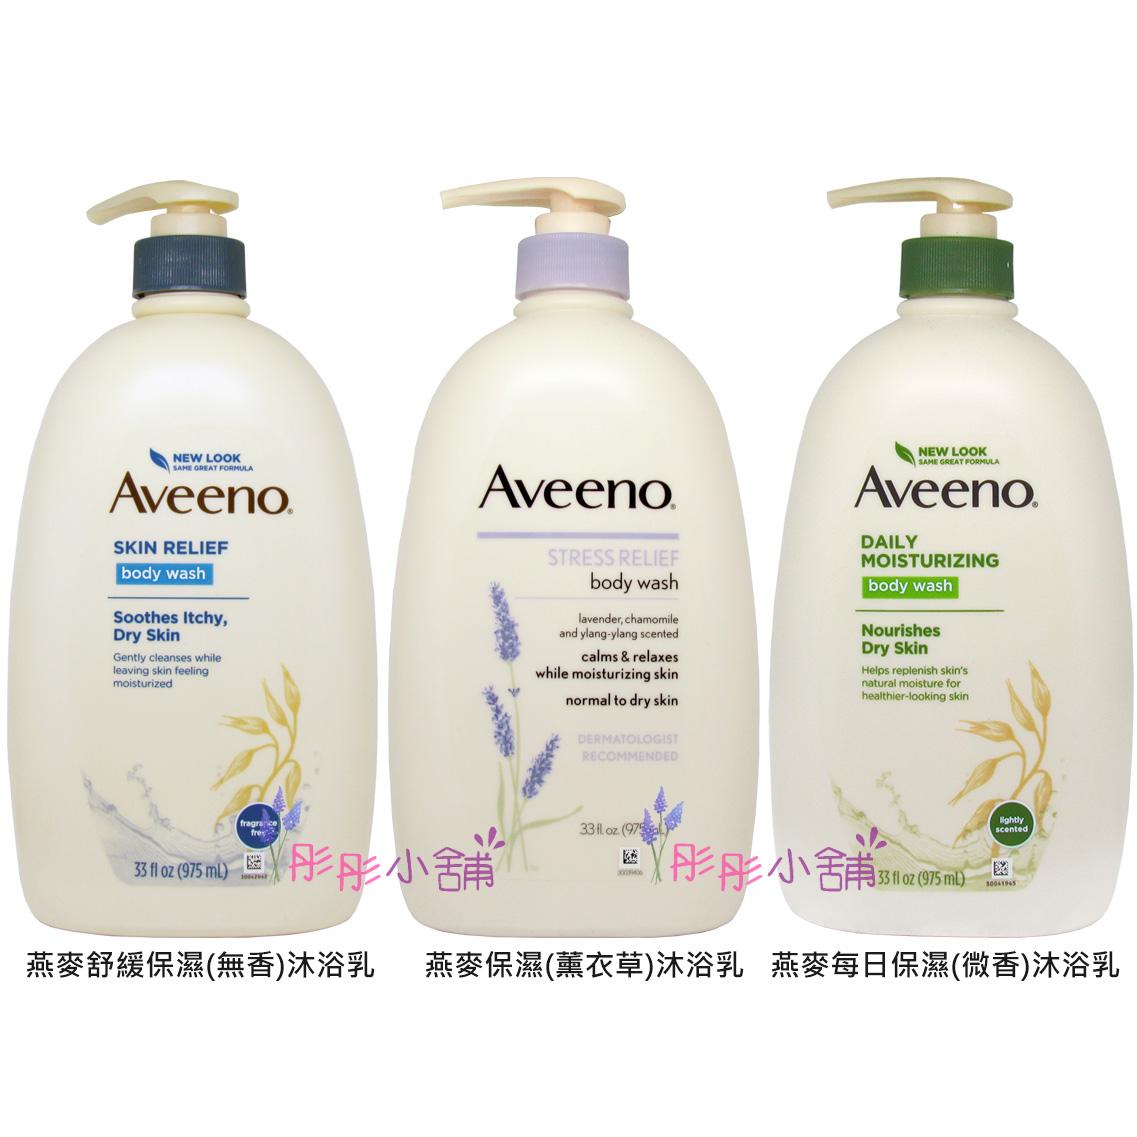 Aveeno Active Naturals 燕麥保濕沐浴乳系列 無香/ 微香 975ml 家庭號【彤彤小舖】